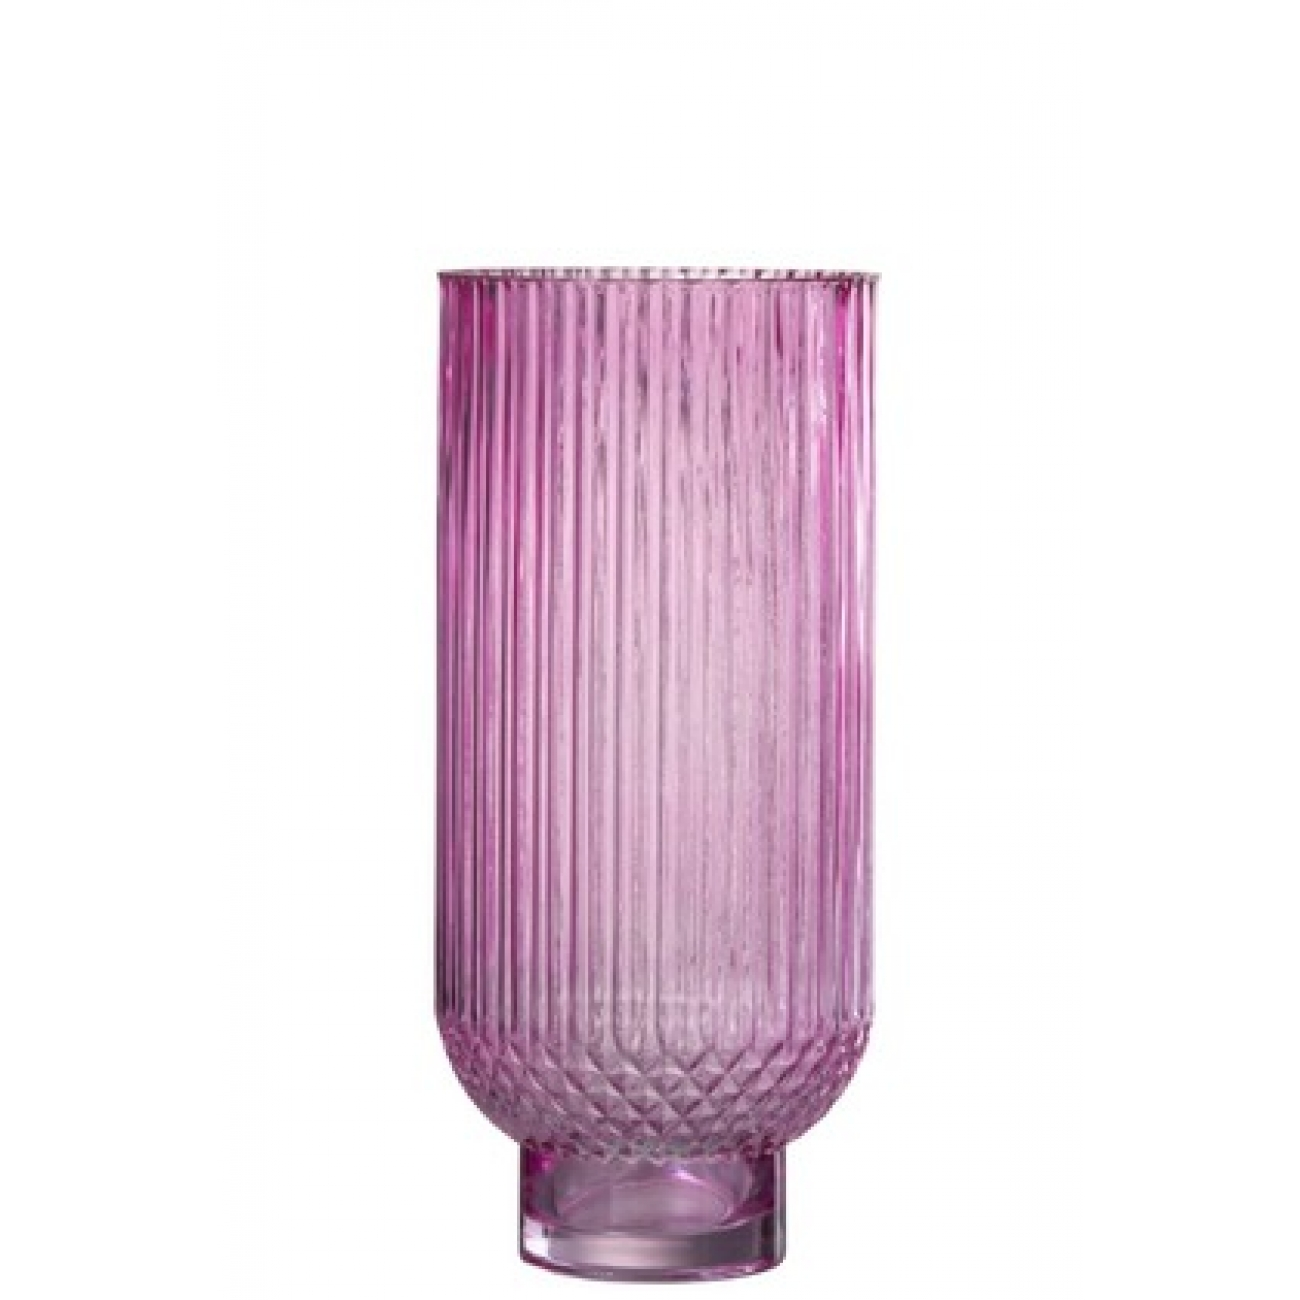 Ваза J-LINE  стеклянная  розовая рельефная  34 см